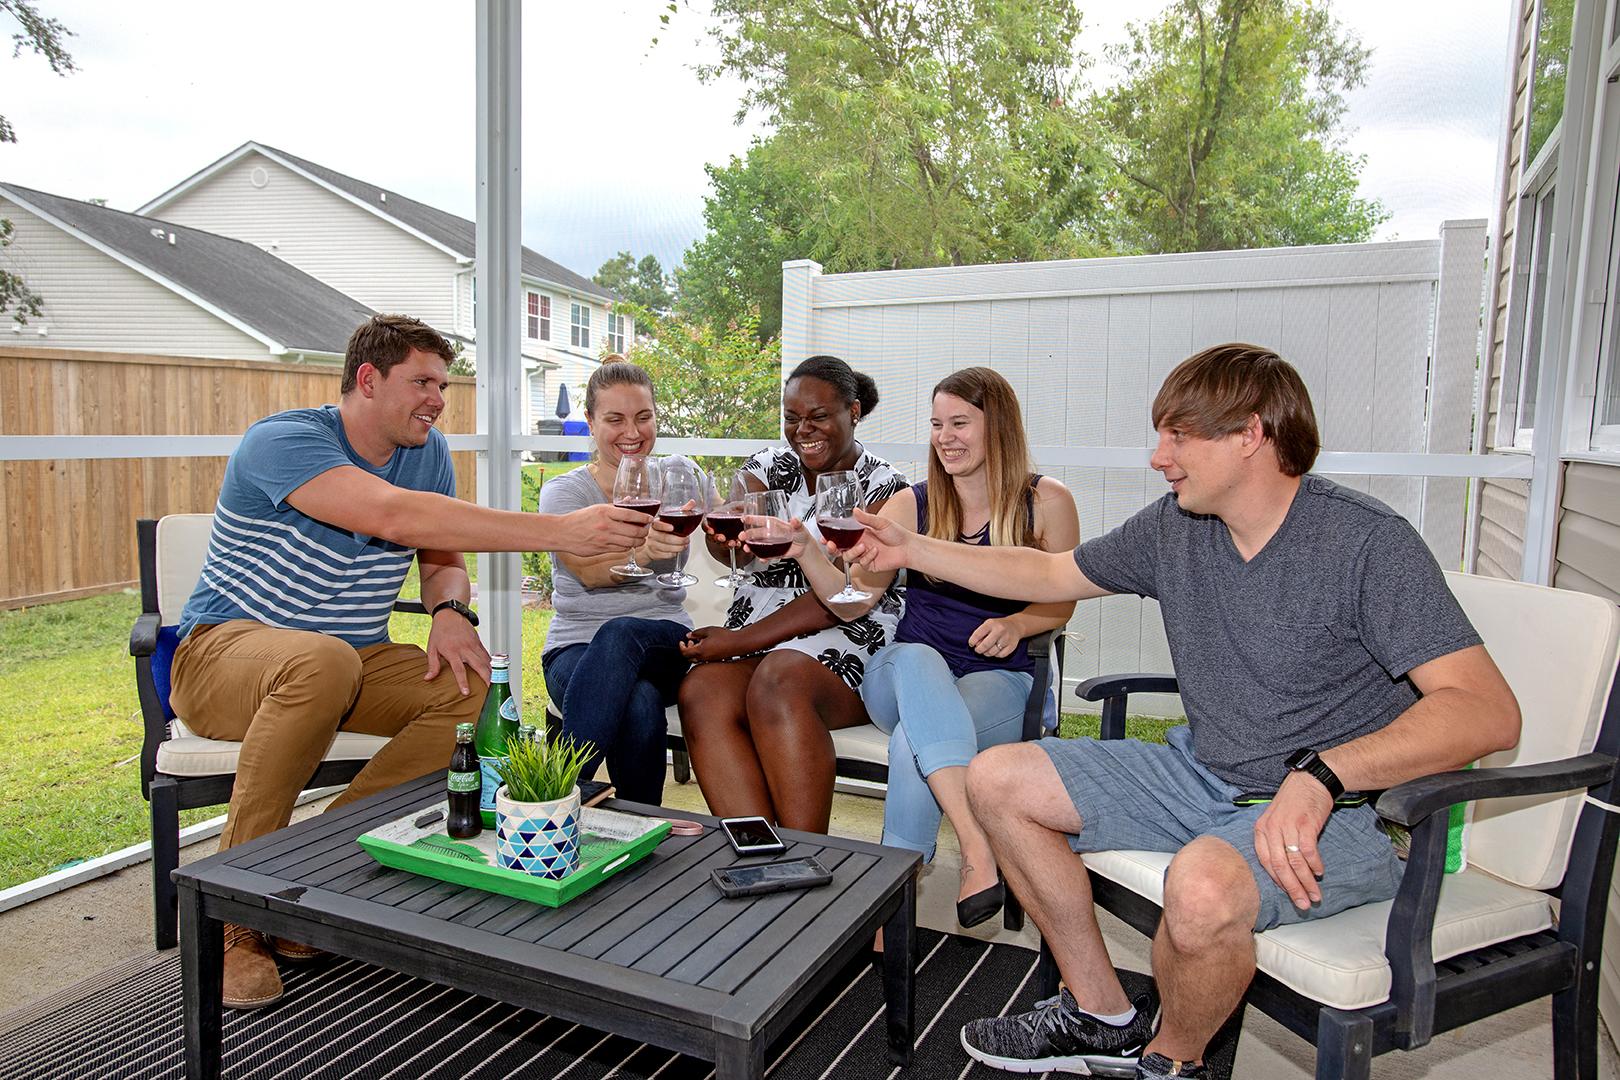 friends-enjoying-wine-outdoors